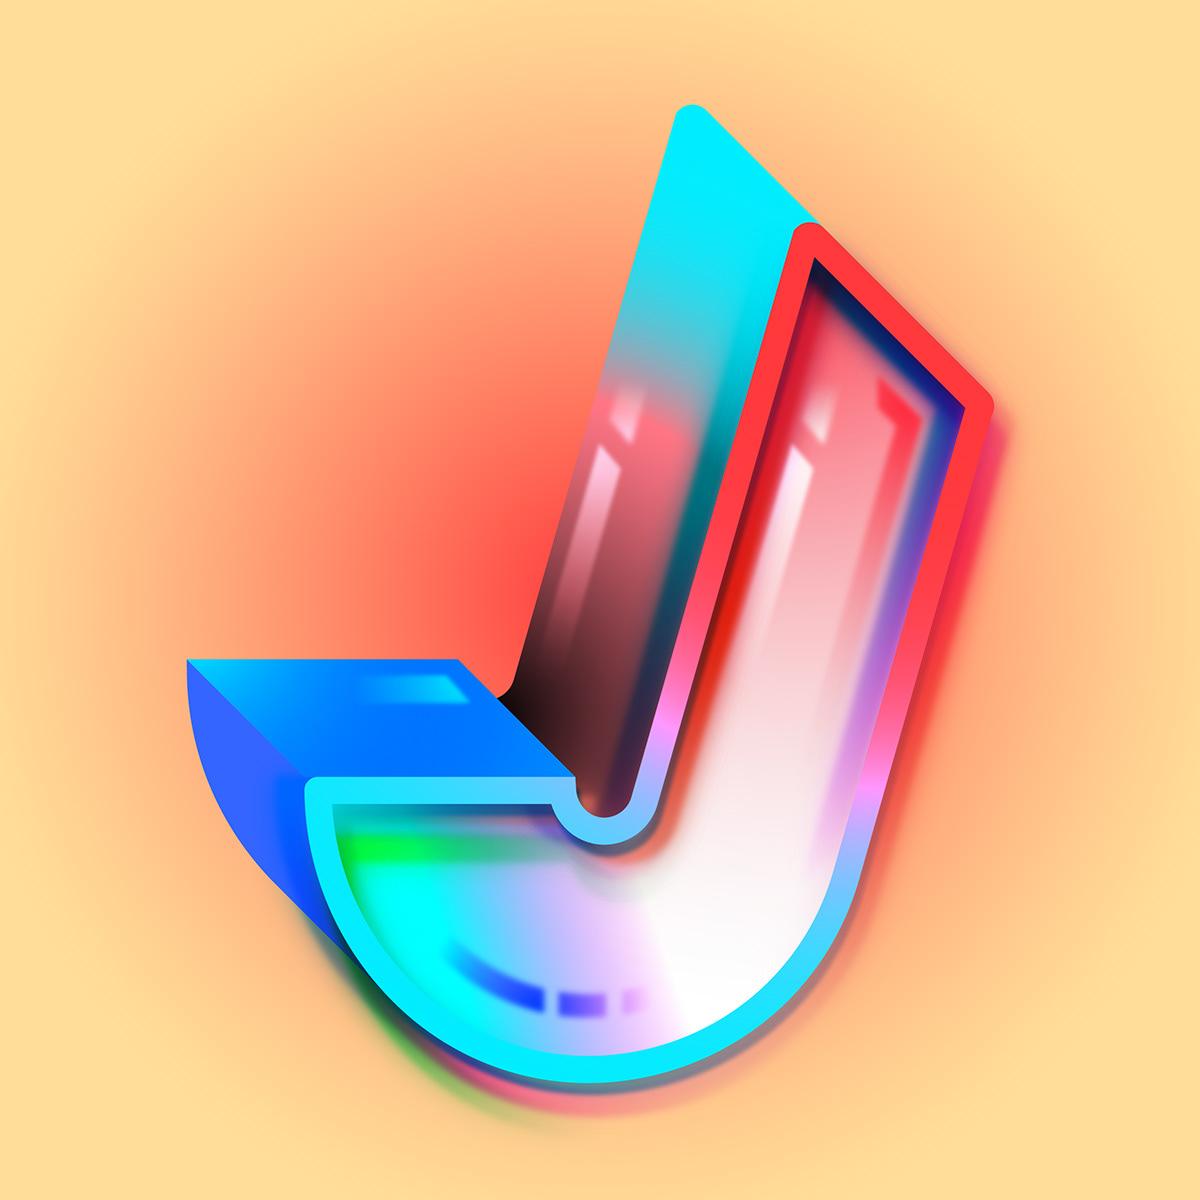 36 days 36daysoftype alphabet challenge digital letters neon tech type typography